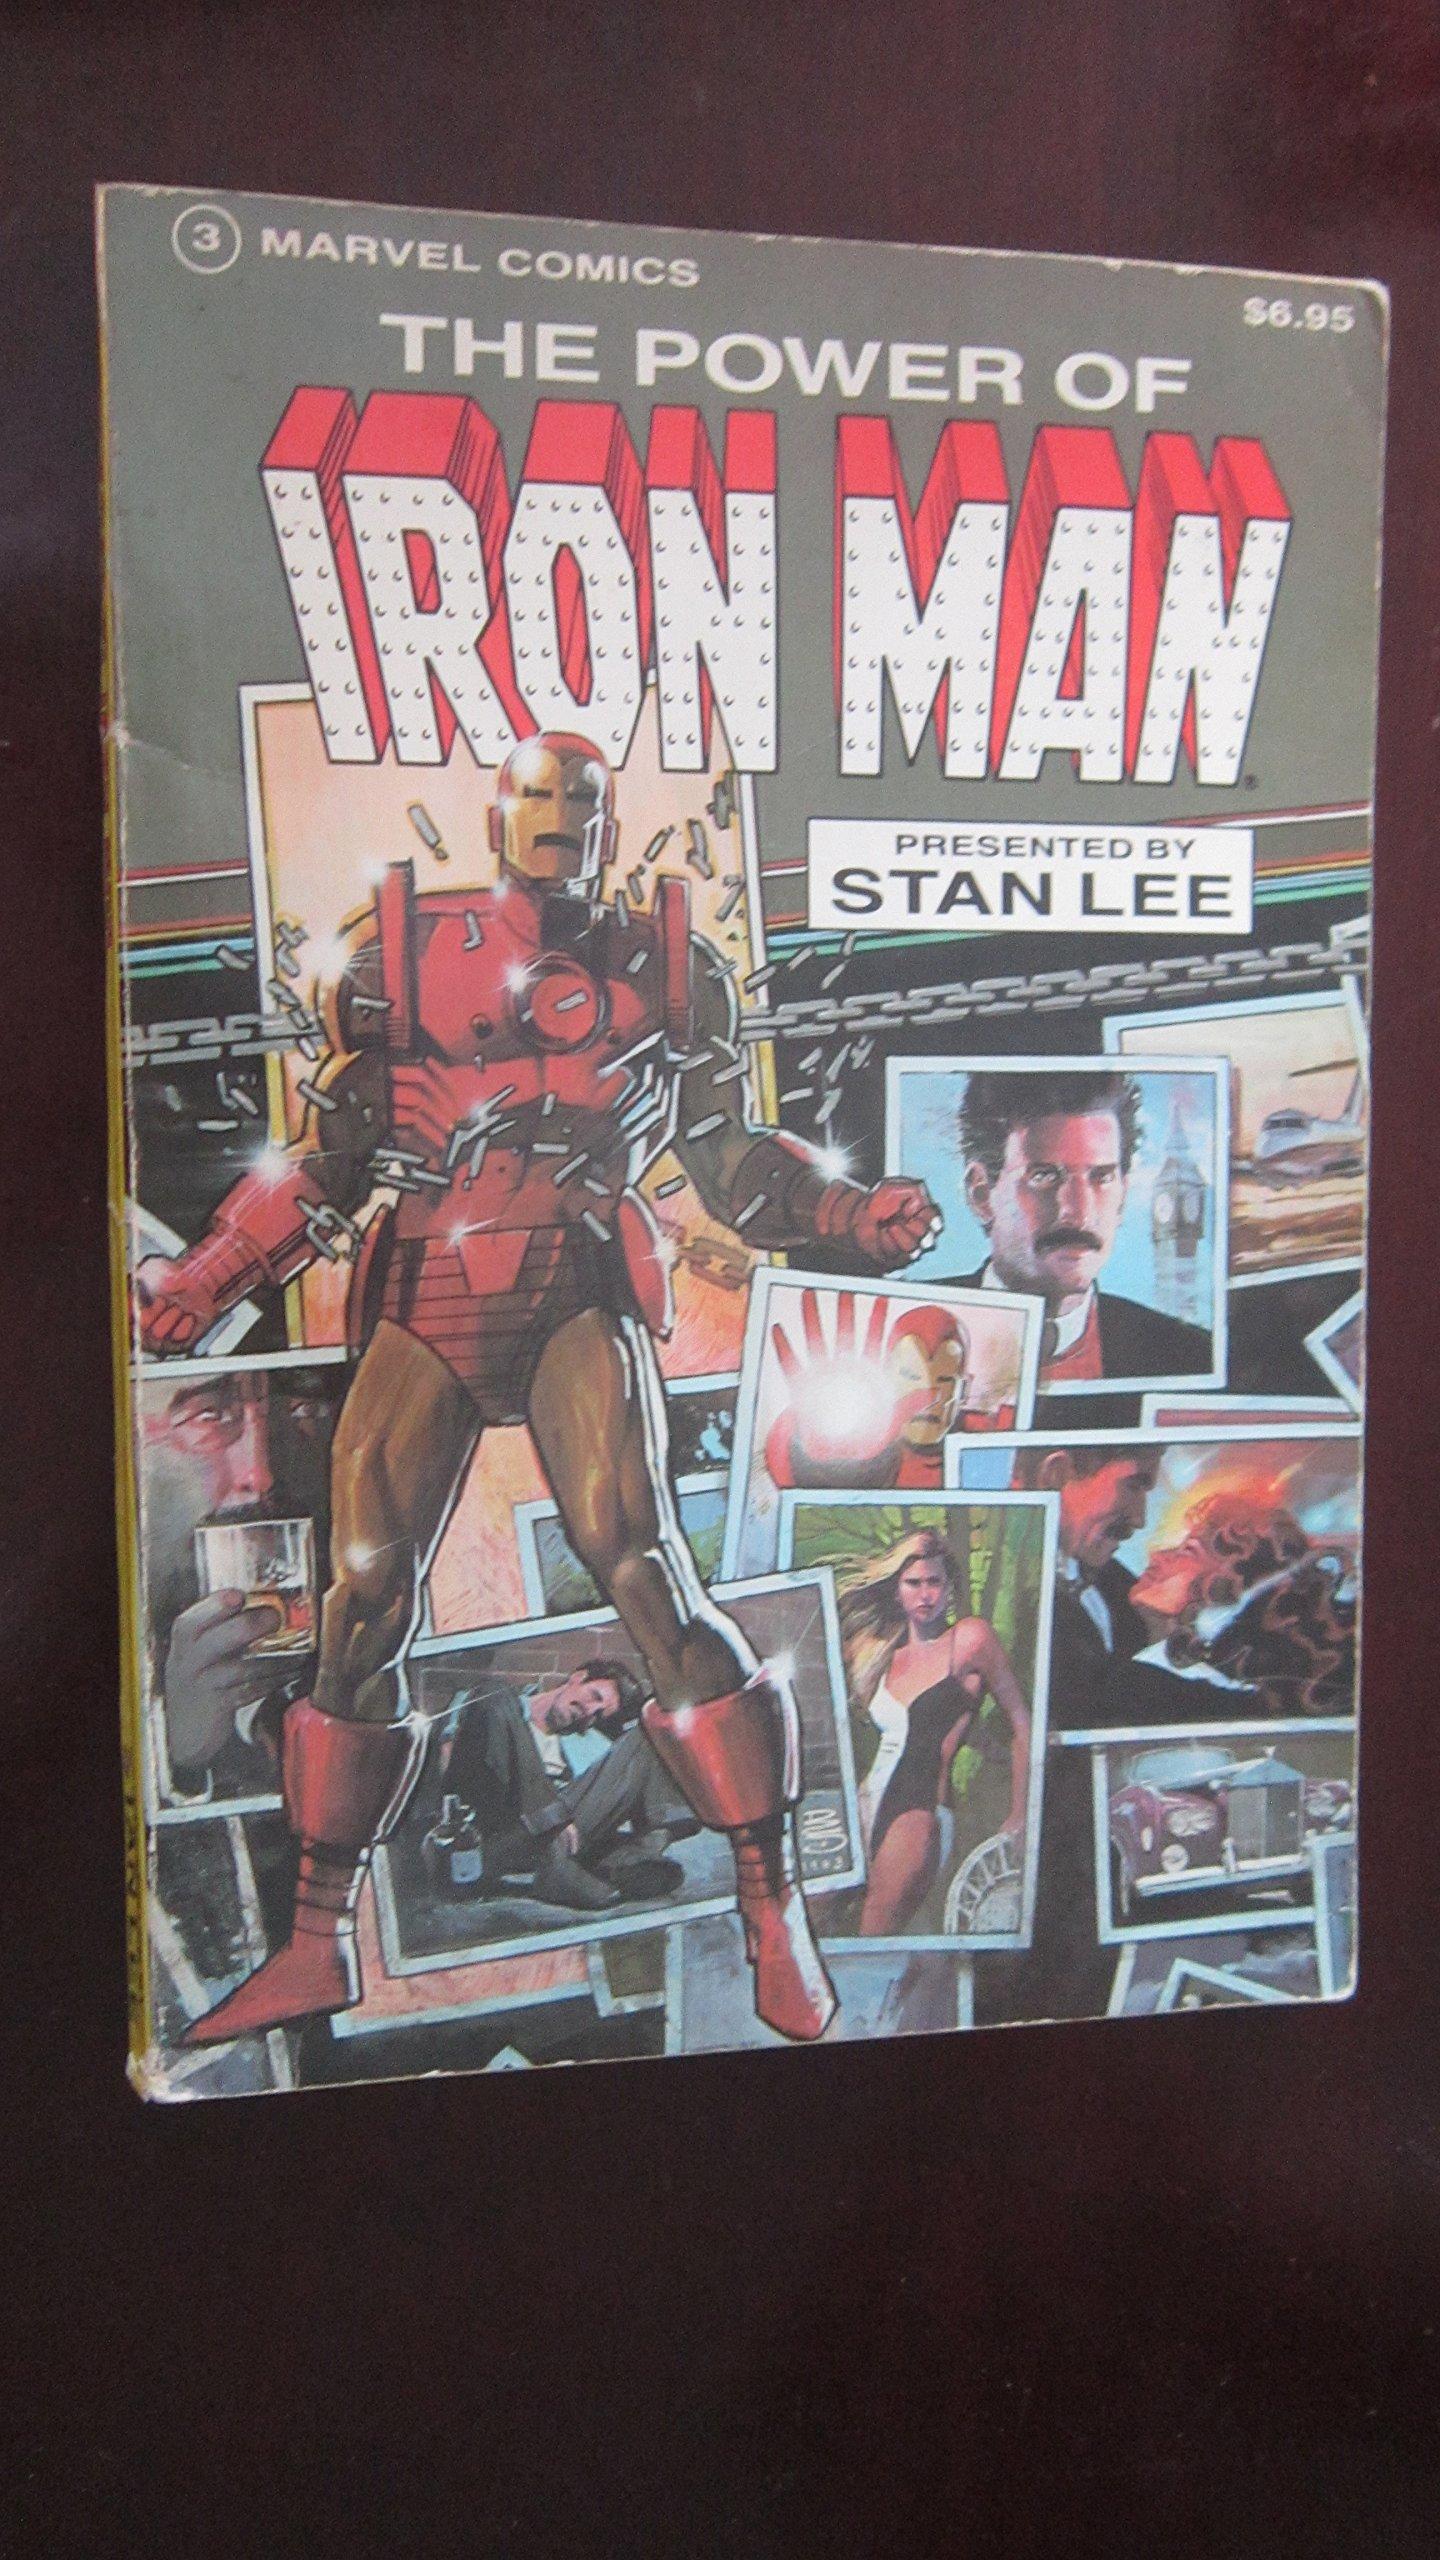 The Invincible Iron Man Amazon Co Uk Staw Lee 9780939766970 Books